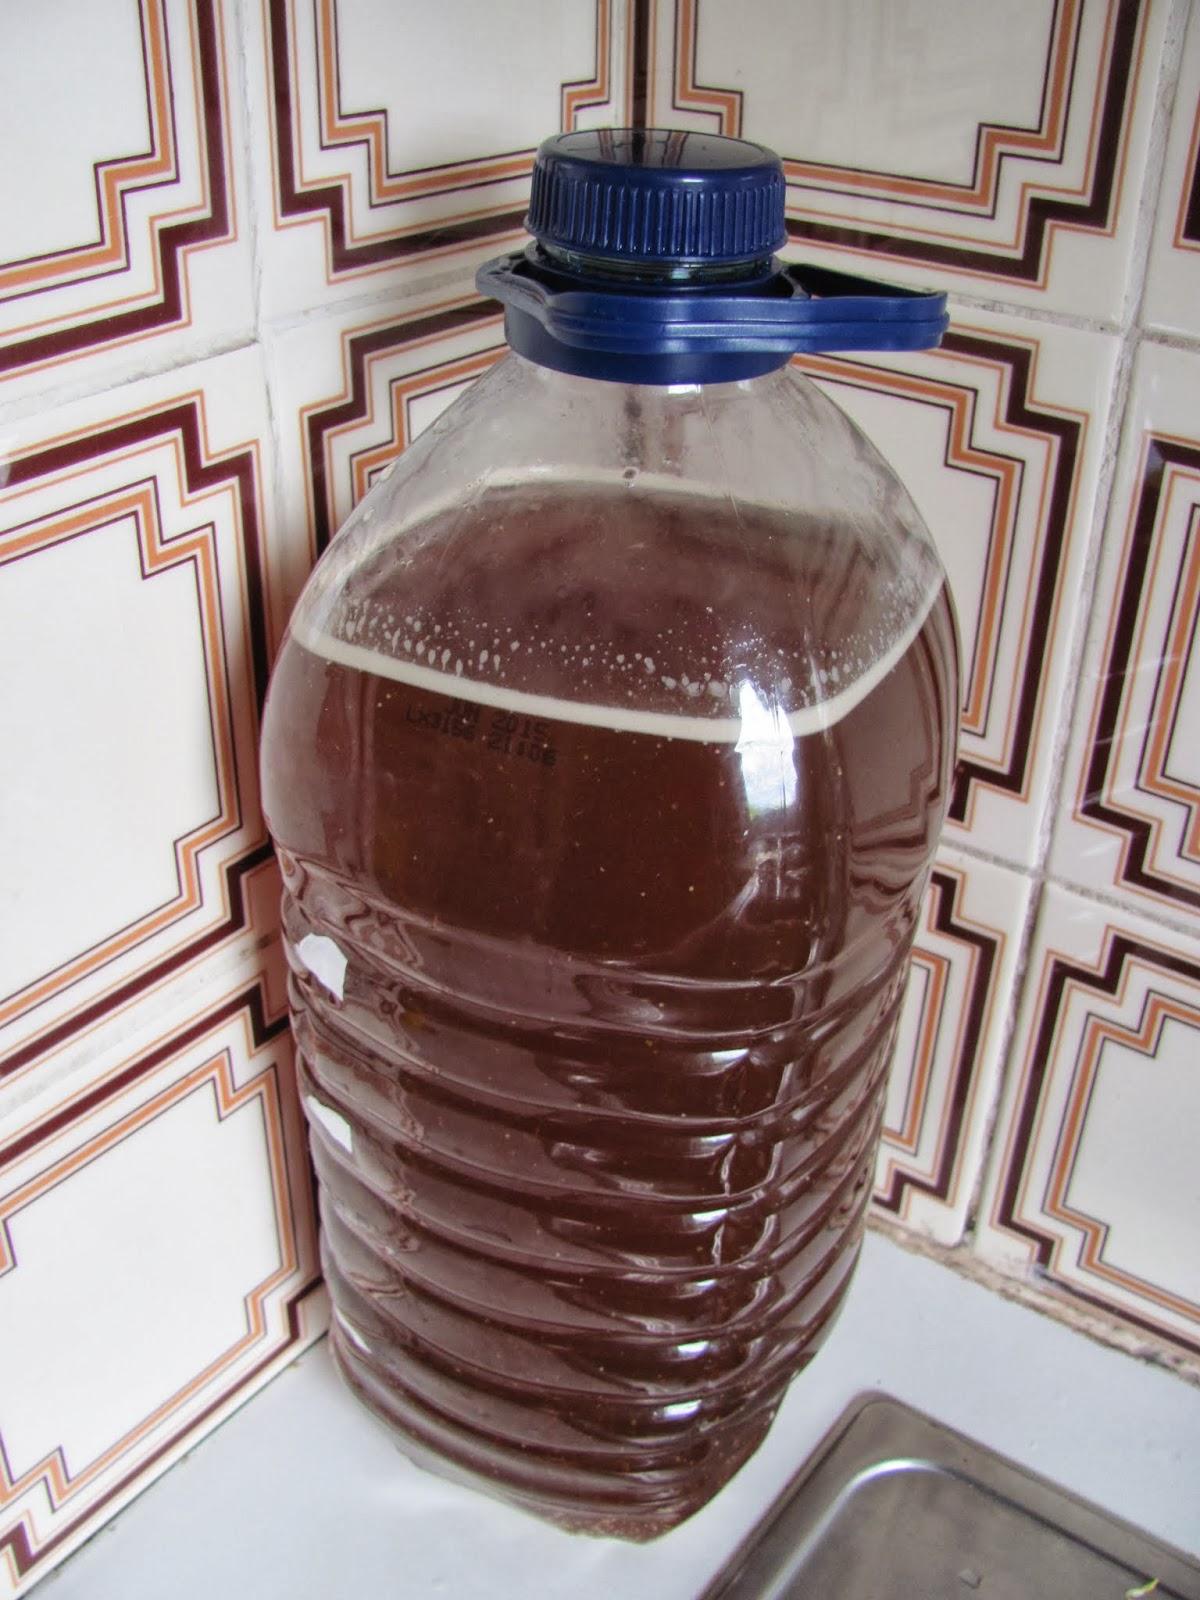 4.5L of hard apple cider in the fermenter before fermentation